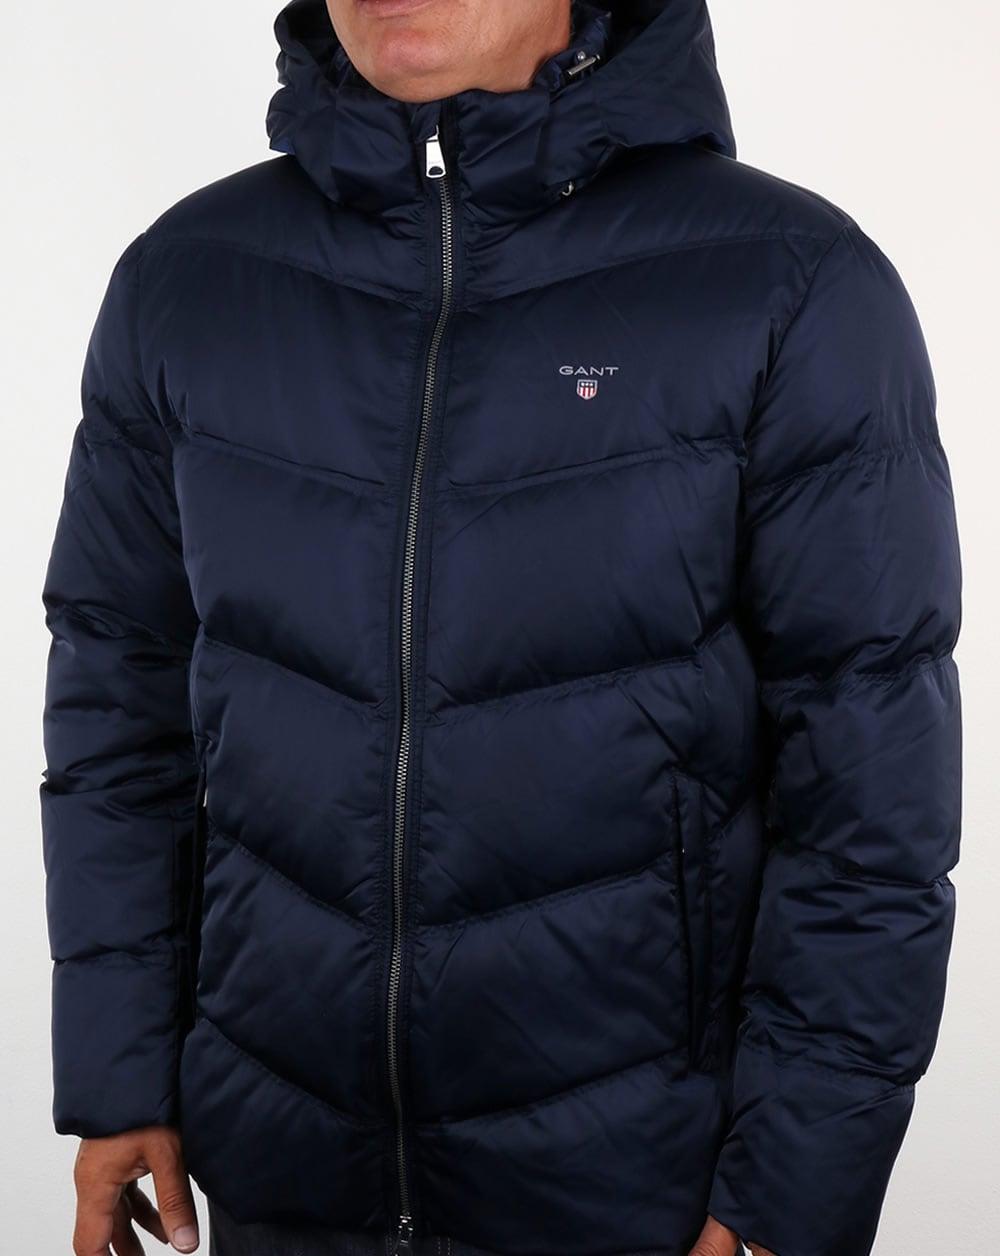 85a9add83c5 Gant Down Filled Padded Jacket Marine Blue